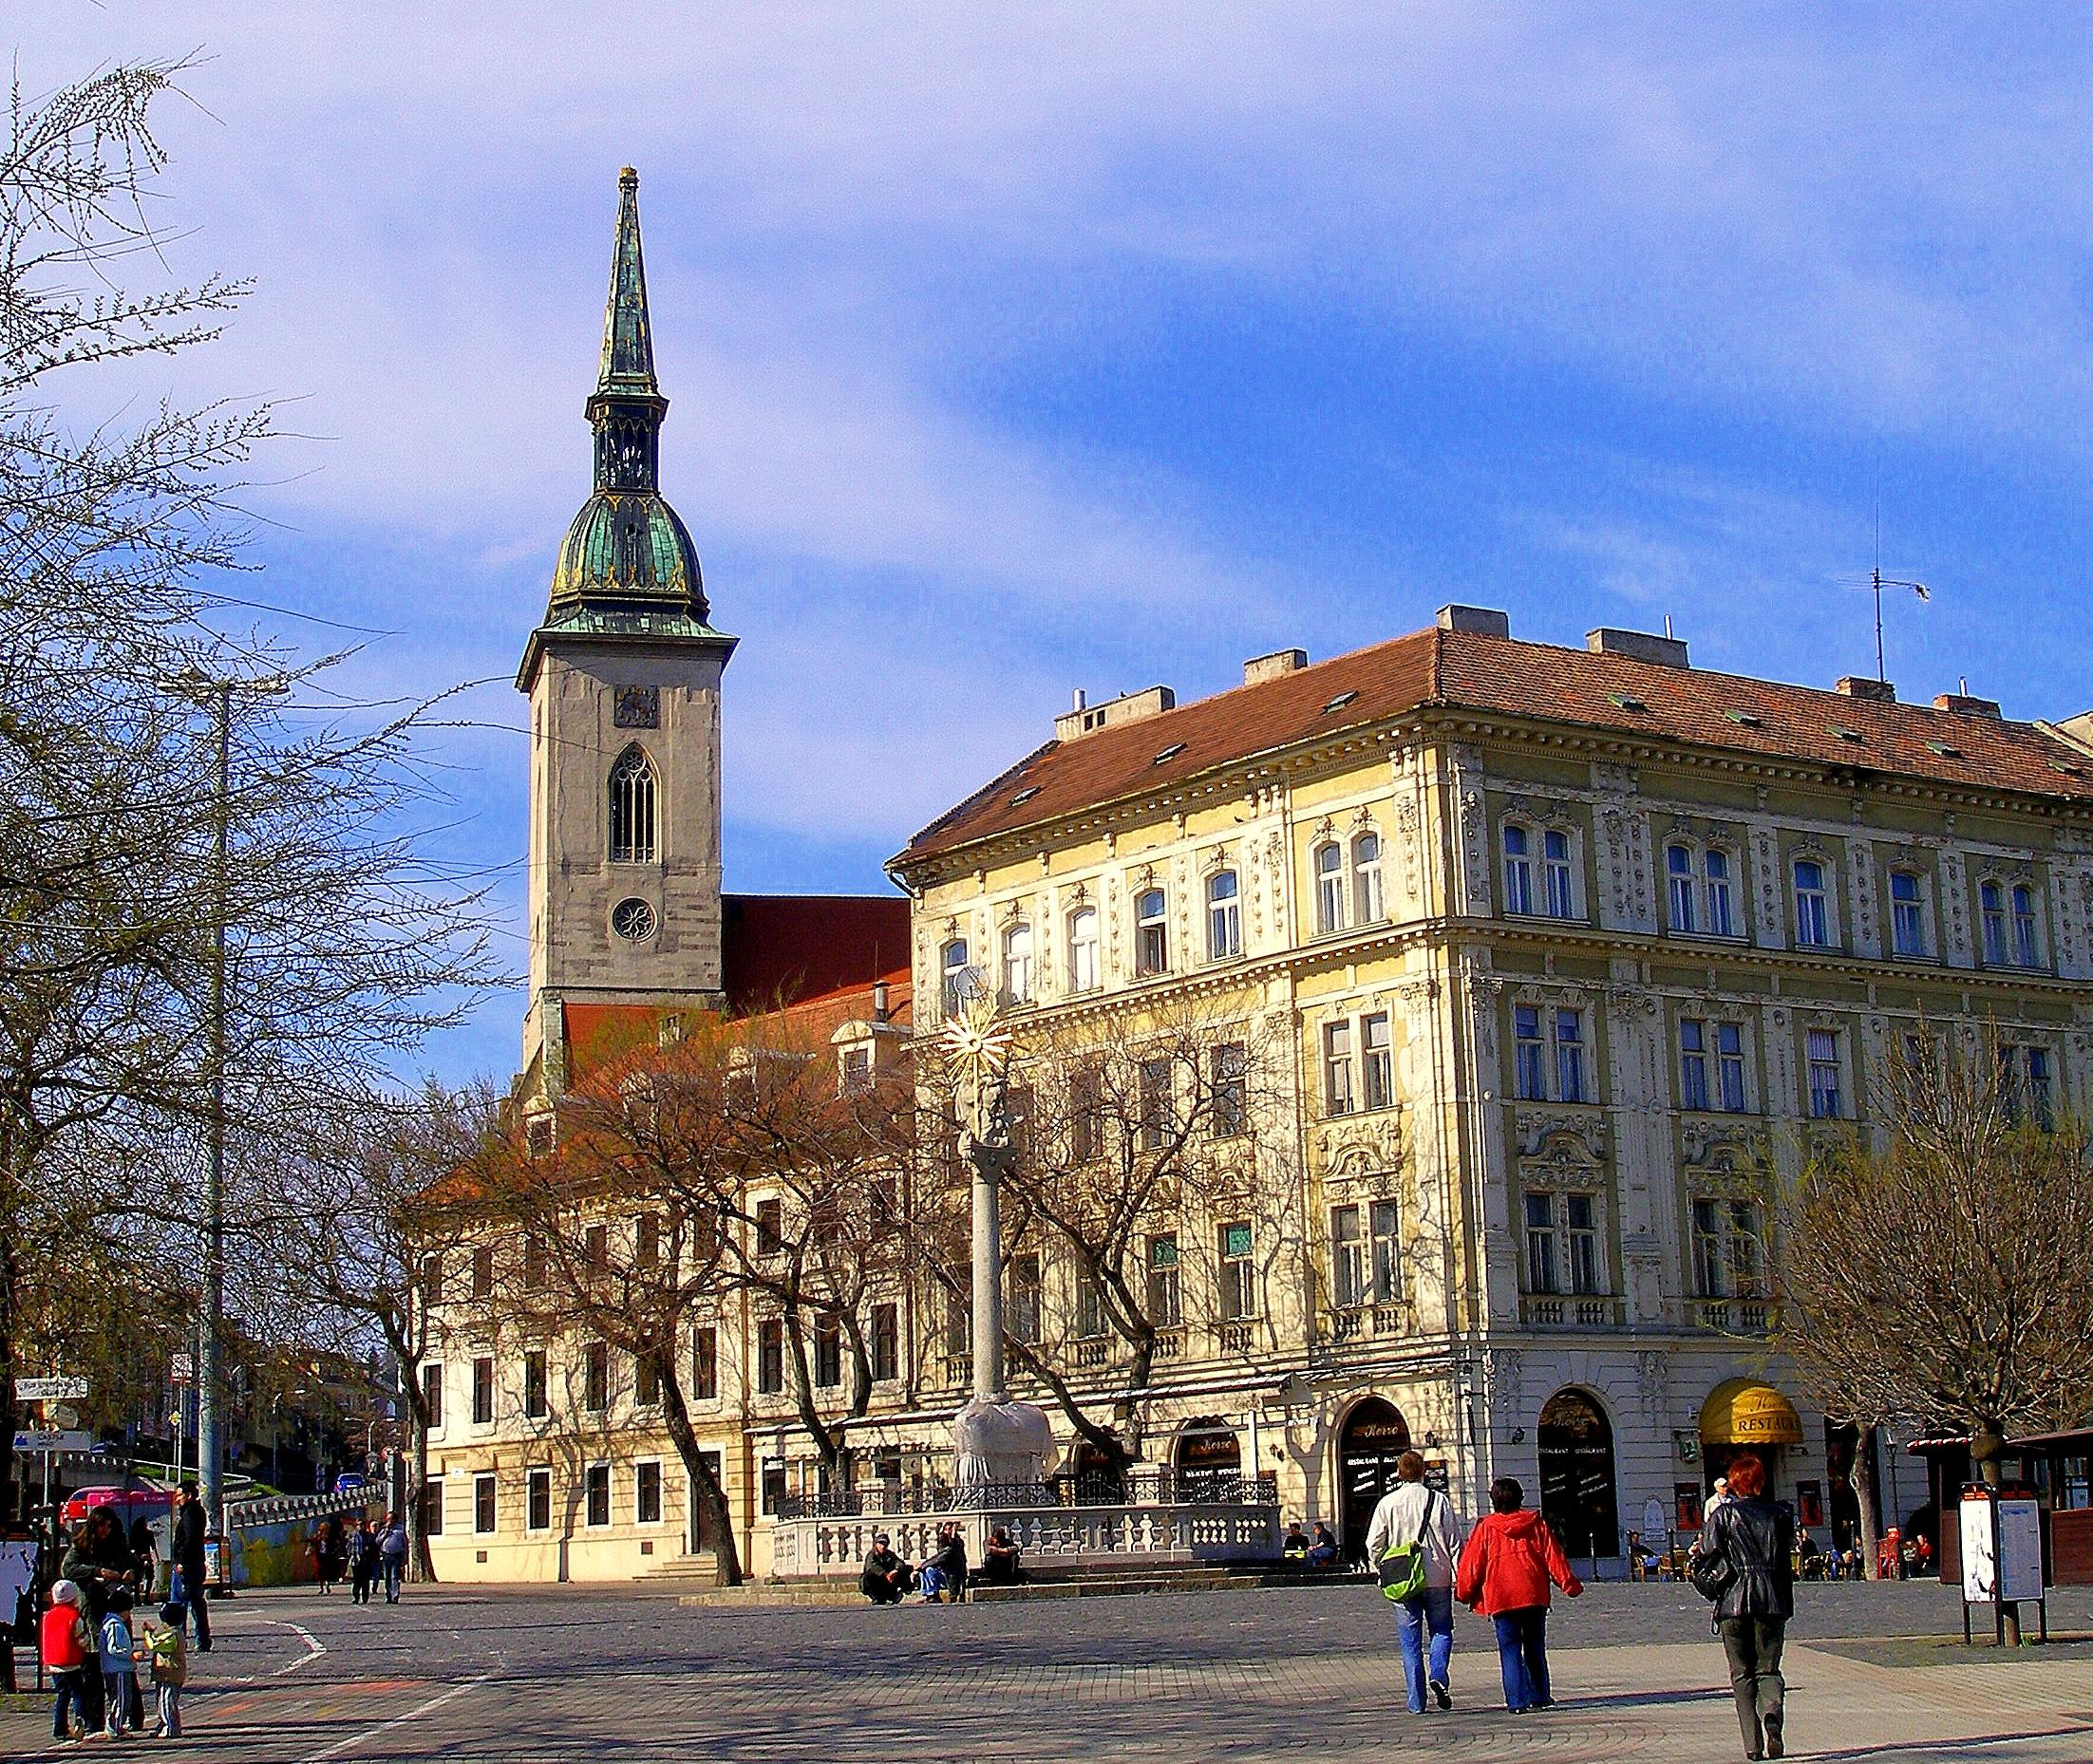 File:Bratislava Slovakia 224.JPG - Wikimedia Commons